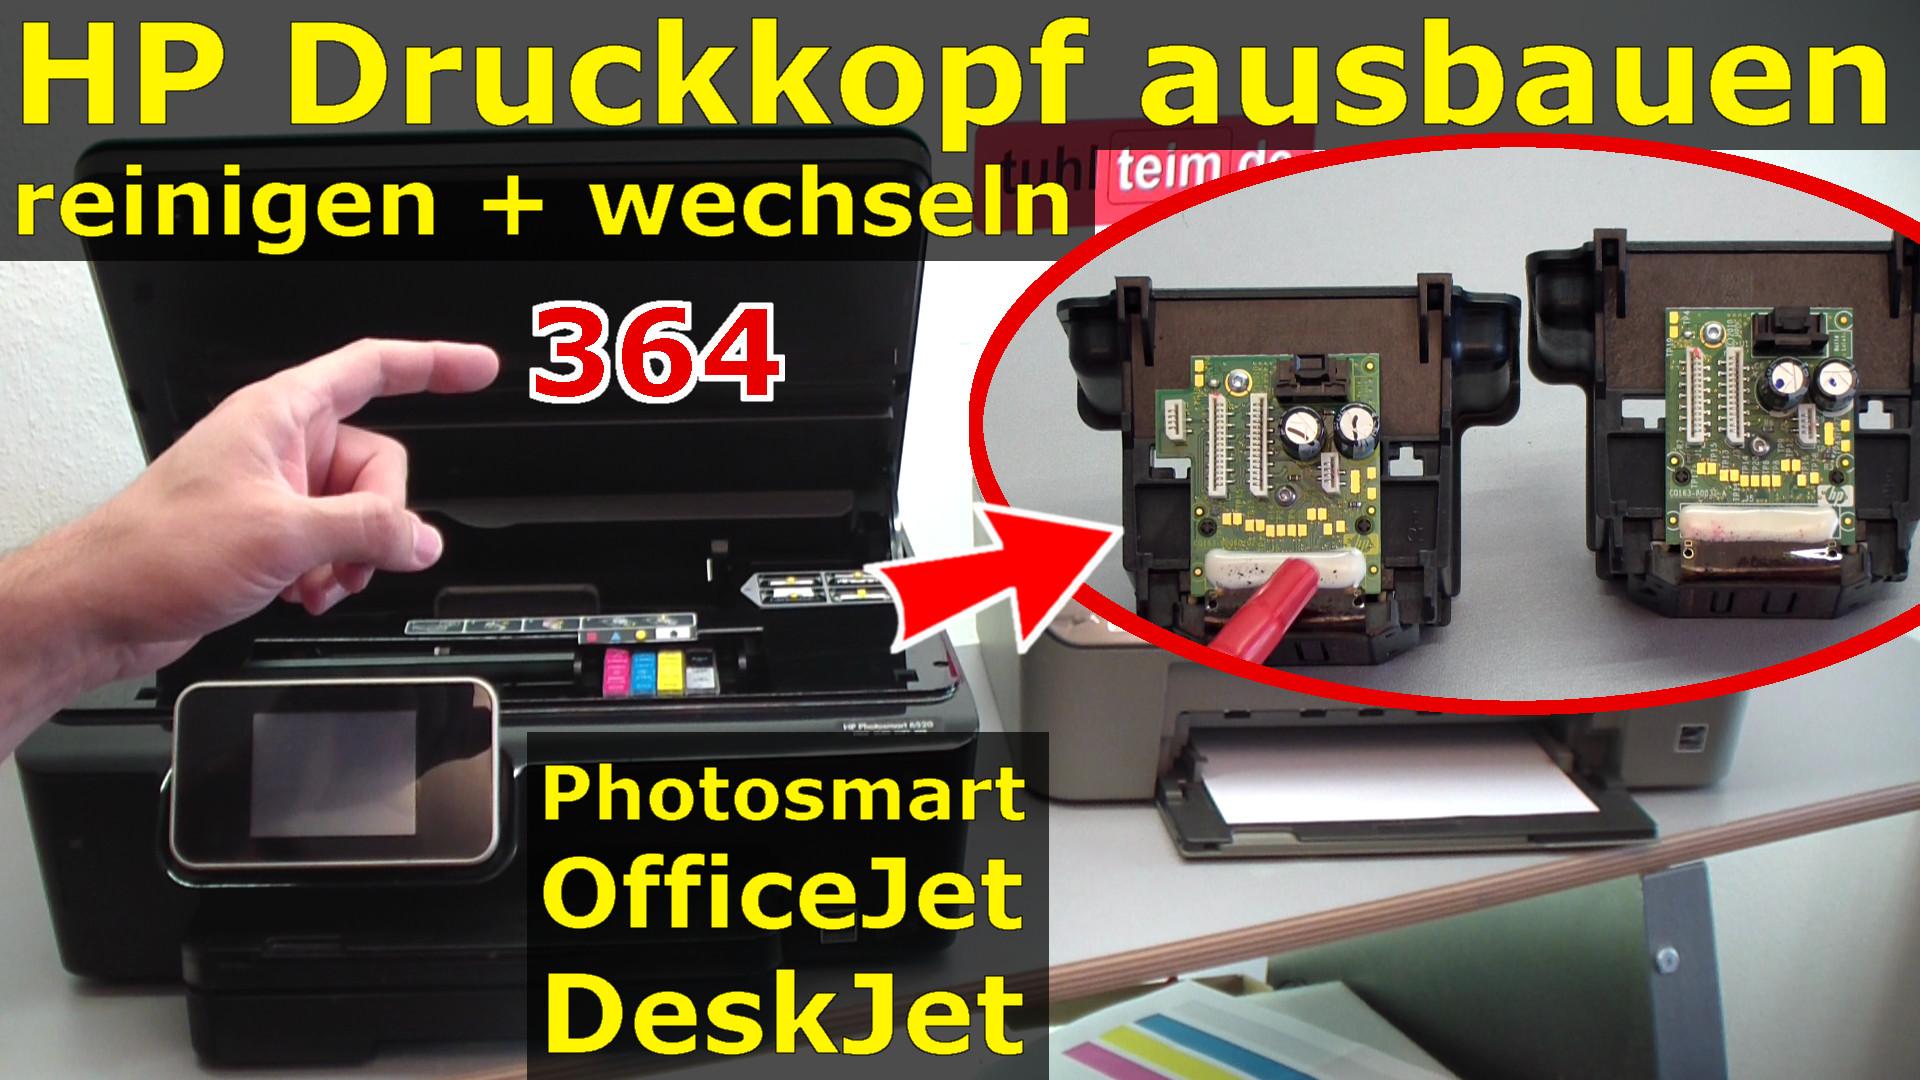 hp druckkopf 364 ausbauen reinigen wechseln 364 patronen bei photosmart officejet deskjet. Black Bedroom Furniture Sets. Home Design Ideas